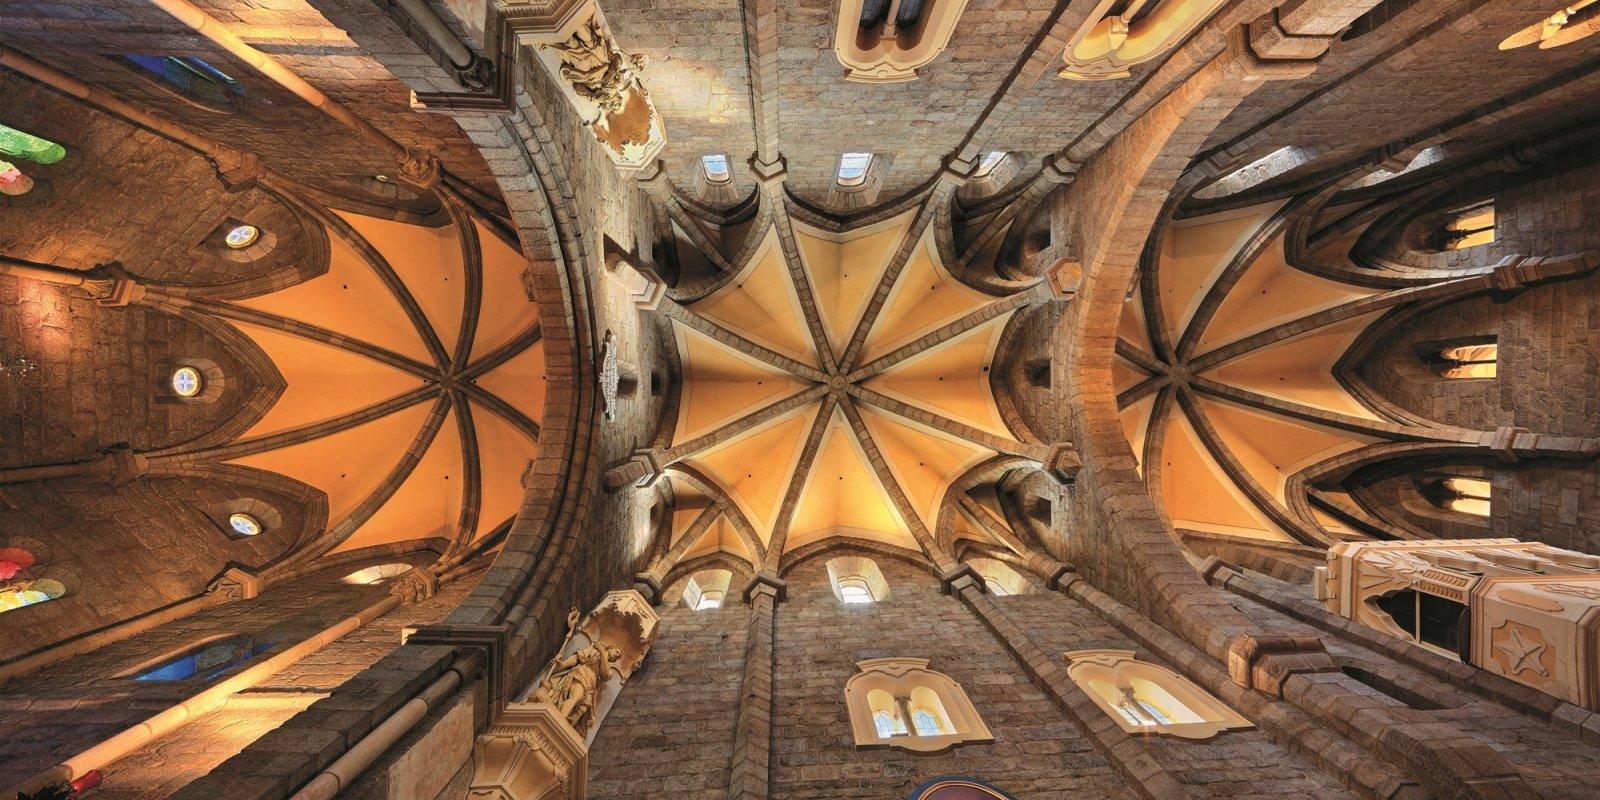 Úchvatný interiér Baziliky sv. Prokopa | © Libor Sváček, archiv CzechTourism